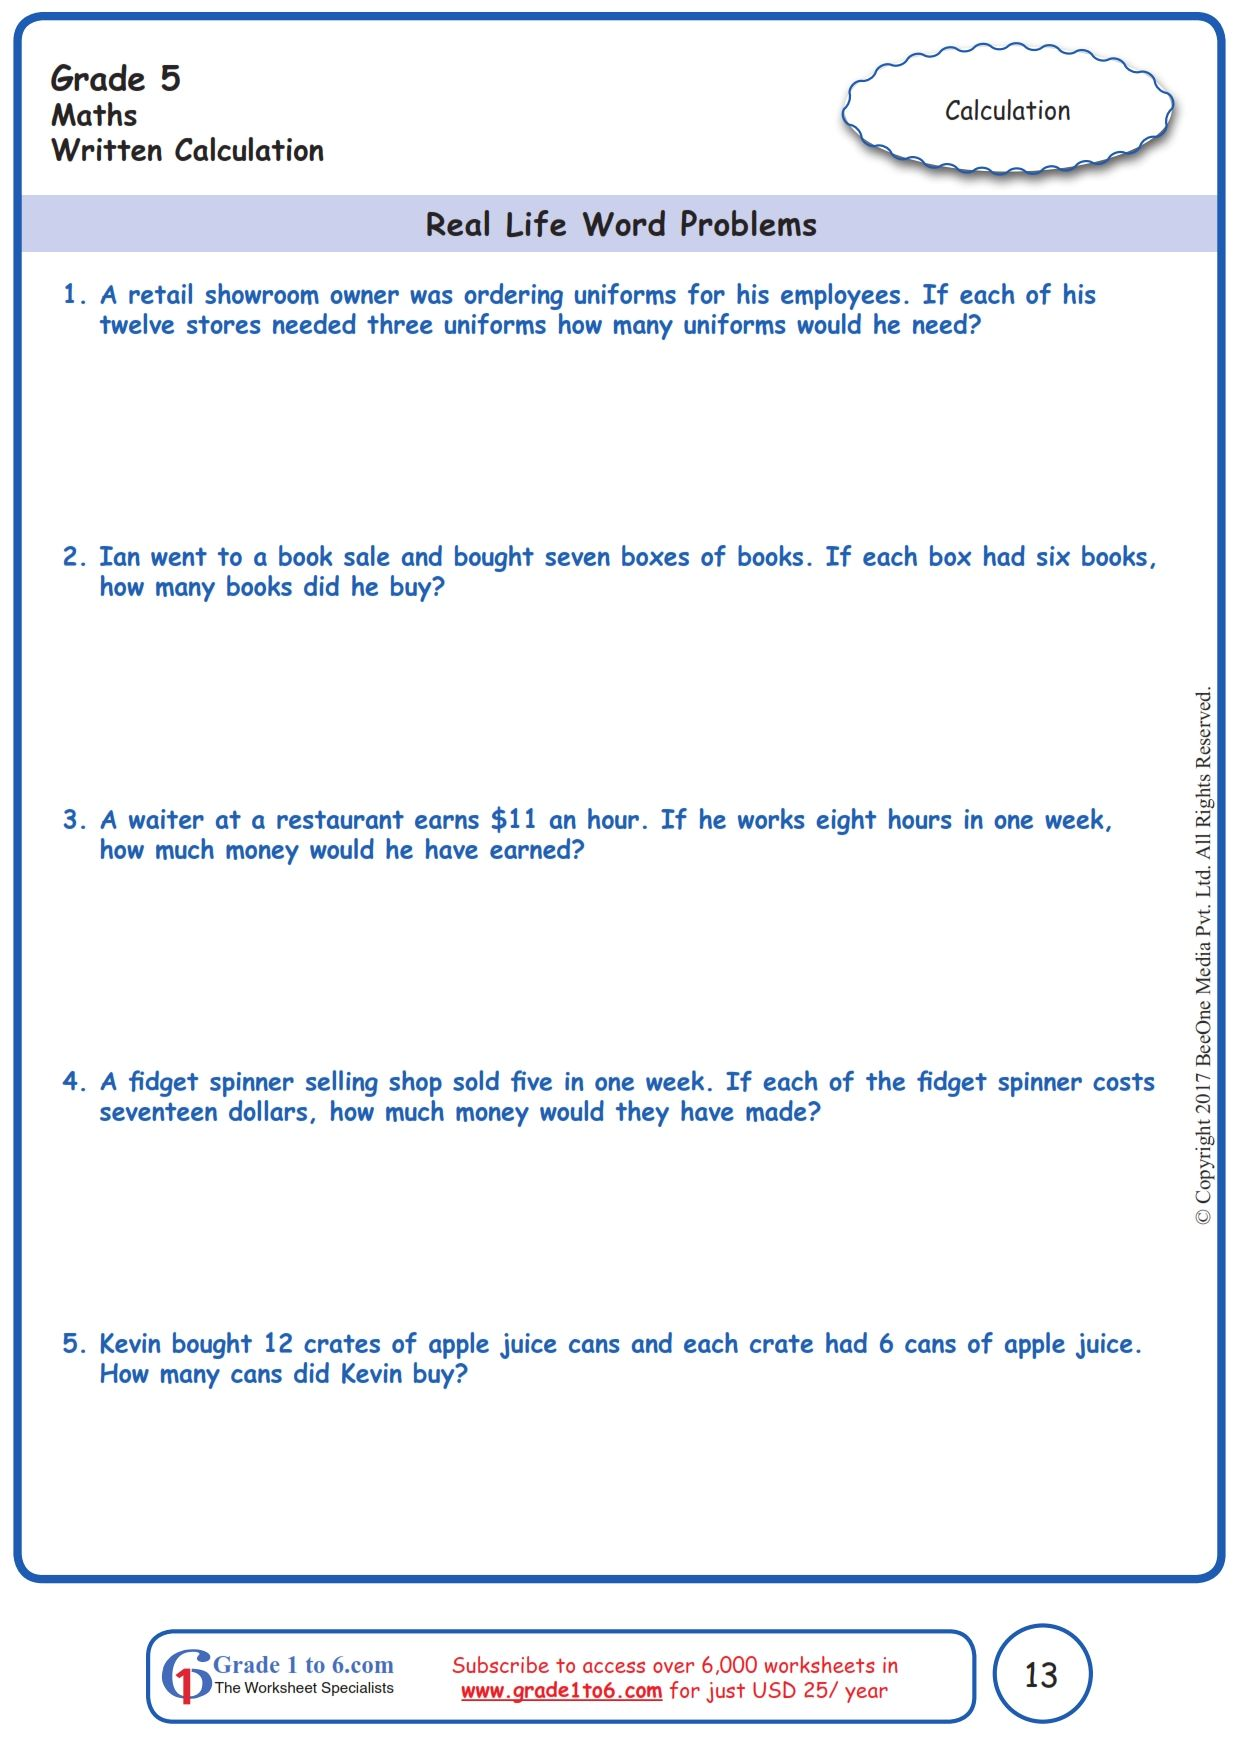 Worksheet Grade 5 Math Real Life Word Problems   Basic math worksheets [ 1754 x 1239 Pixel ]